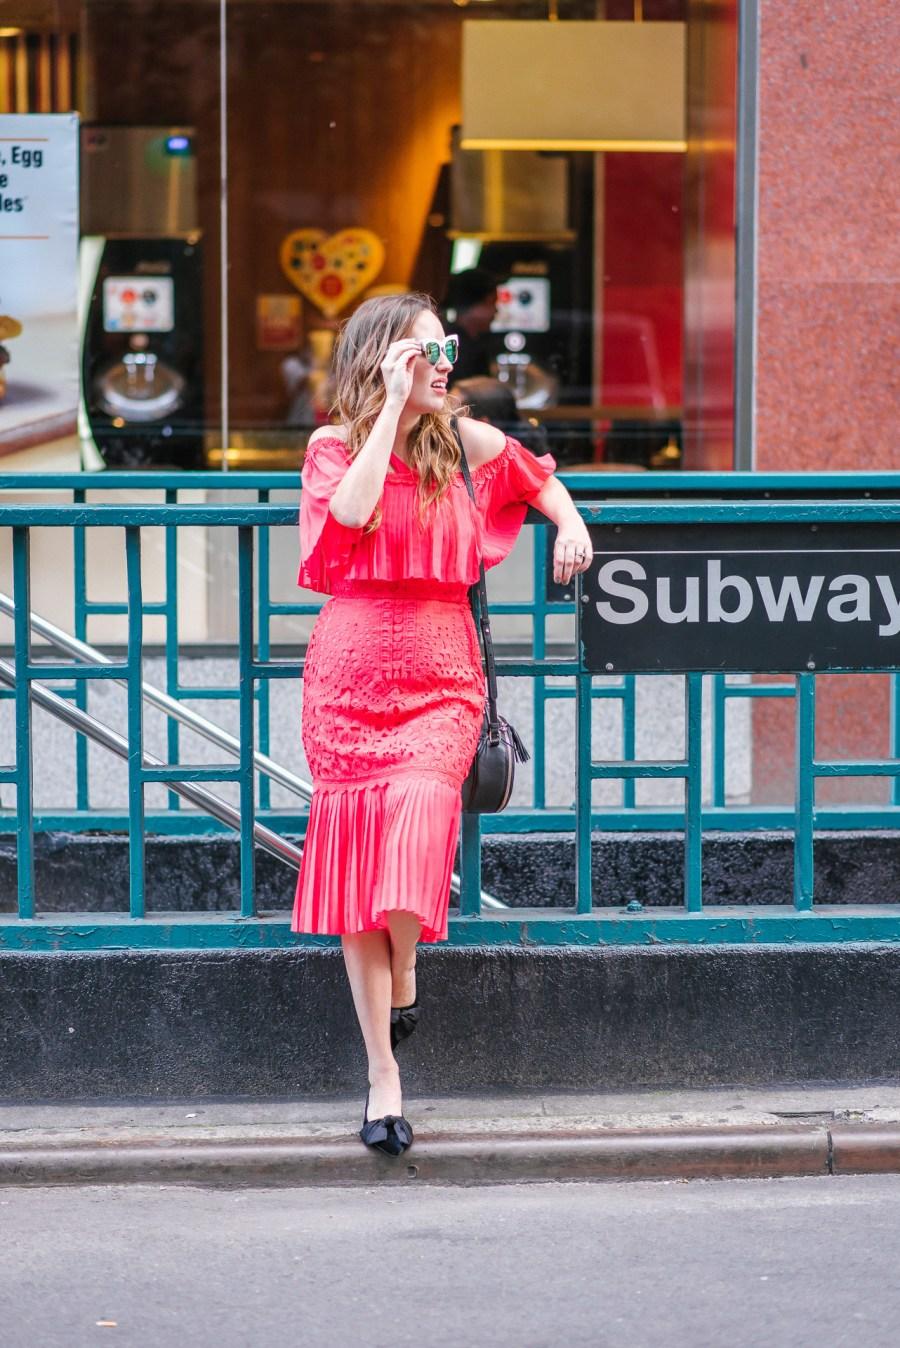 New York Fashion Week - Red Dress Street Style Inspiration